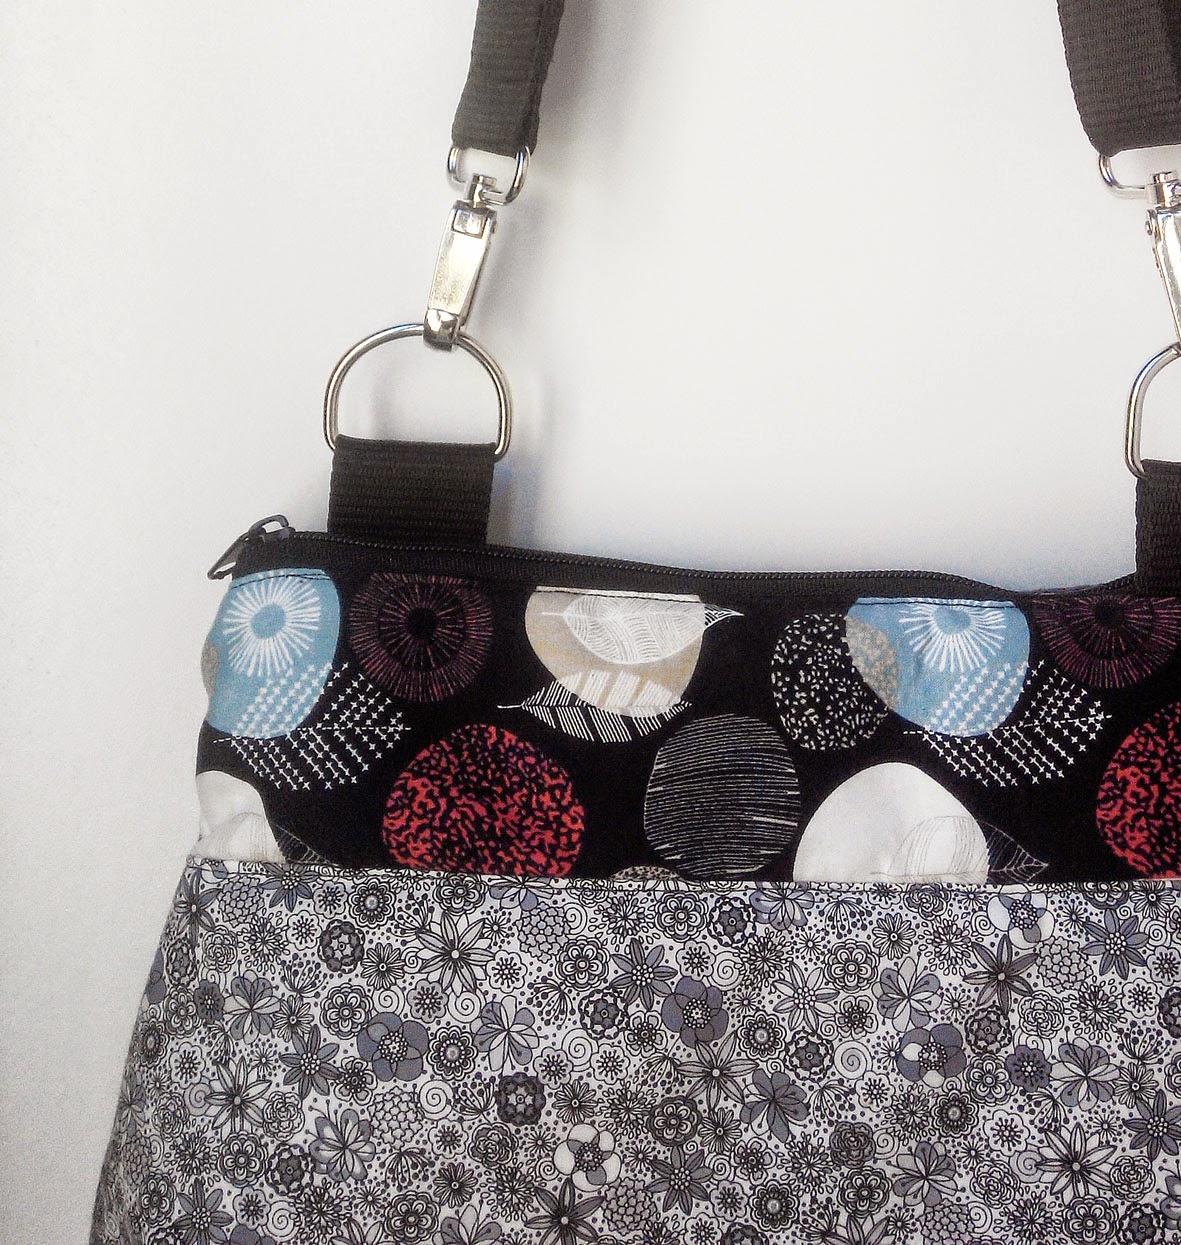 bolsos algodon ecologico, bolsos handmade, moda sostenible